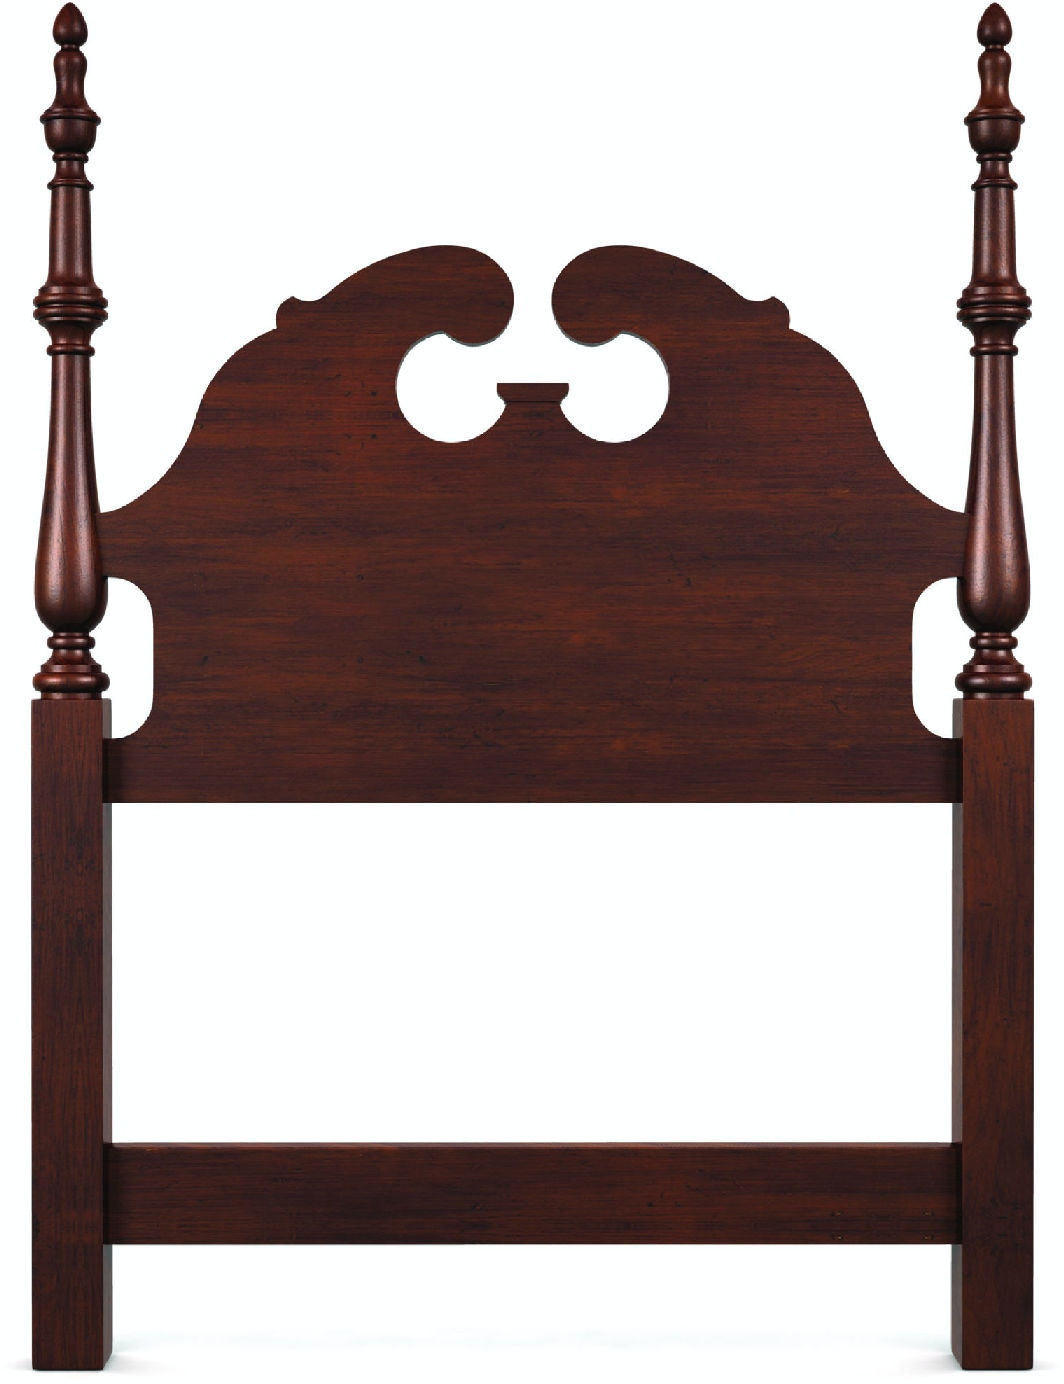 Drexel Heritage Dining Room Sets Drexel Bedroom Twin Headboard 153 313hb Lauters Fine